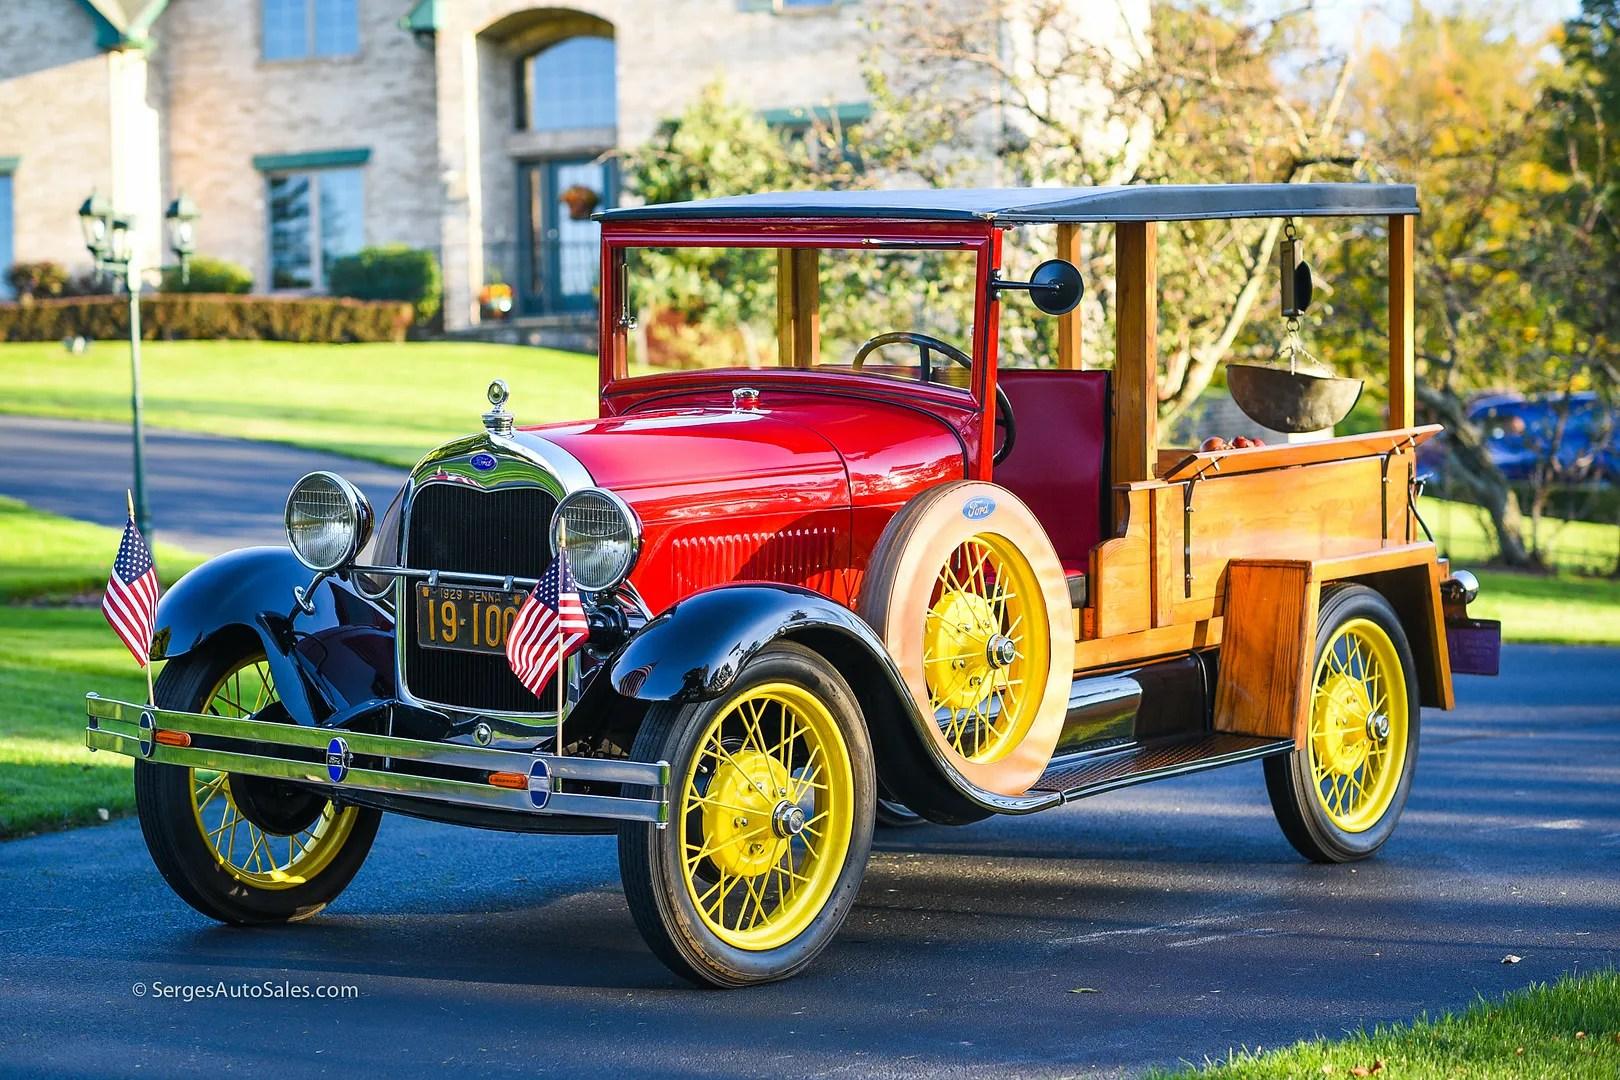 photo 1929-Ford-Model-A-Huckster-for-sale-serges-auto-sales-northeast-pennsylvania-scranton-muscle-cars-corvettes--3_zpsi5yocivi.jpg